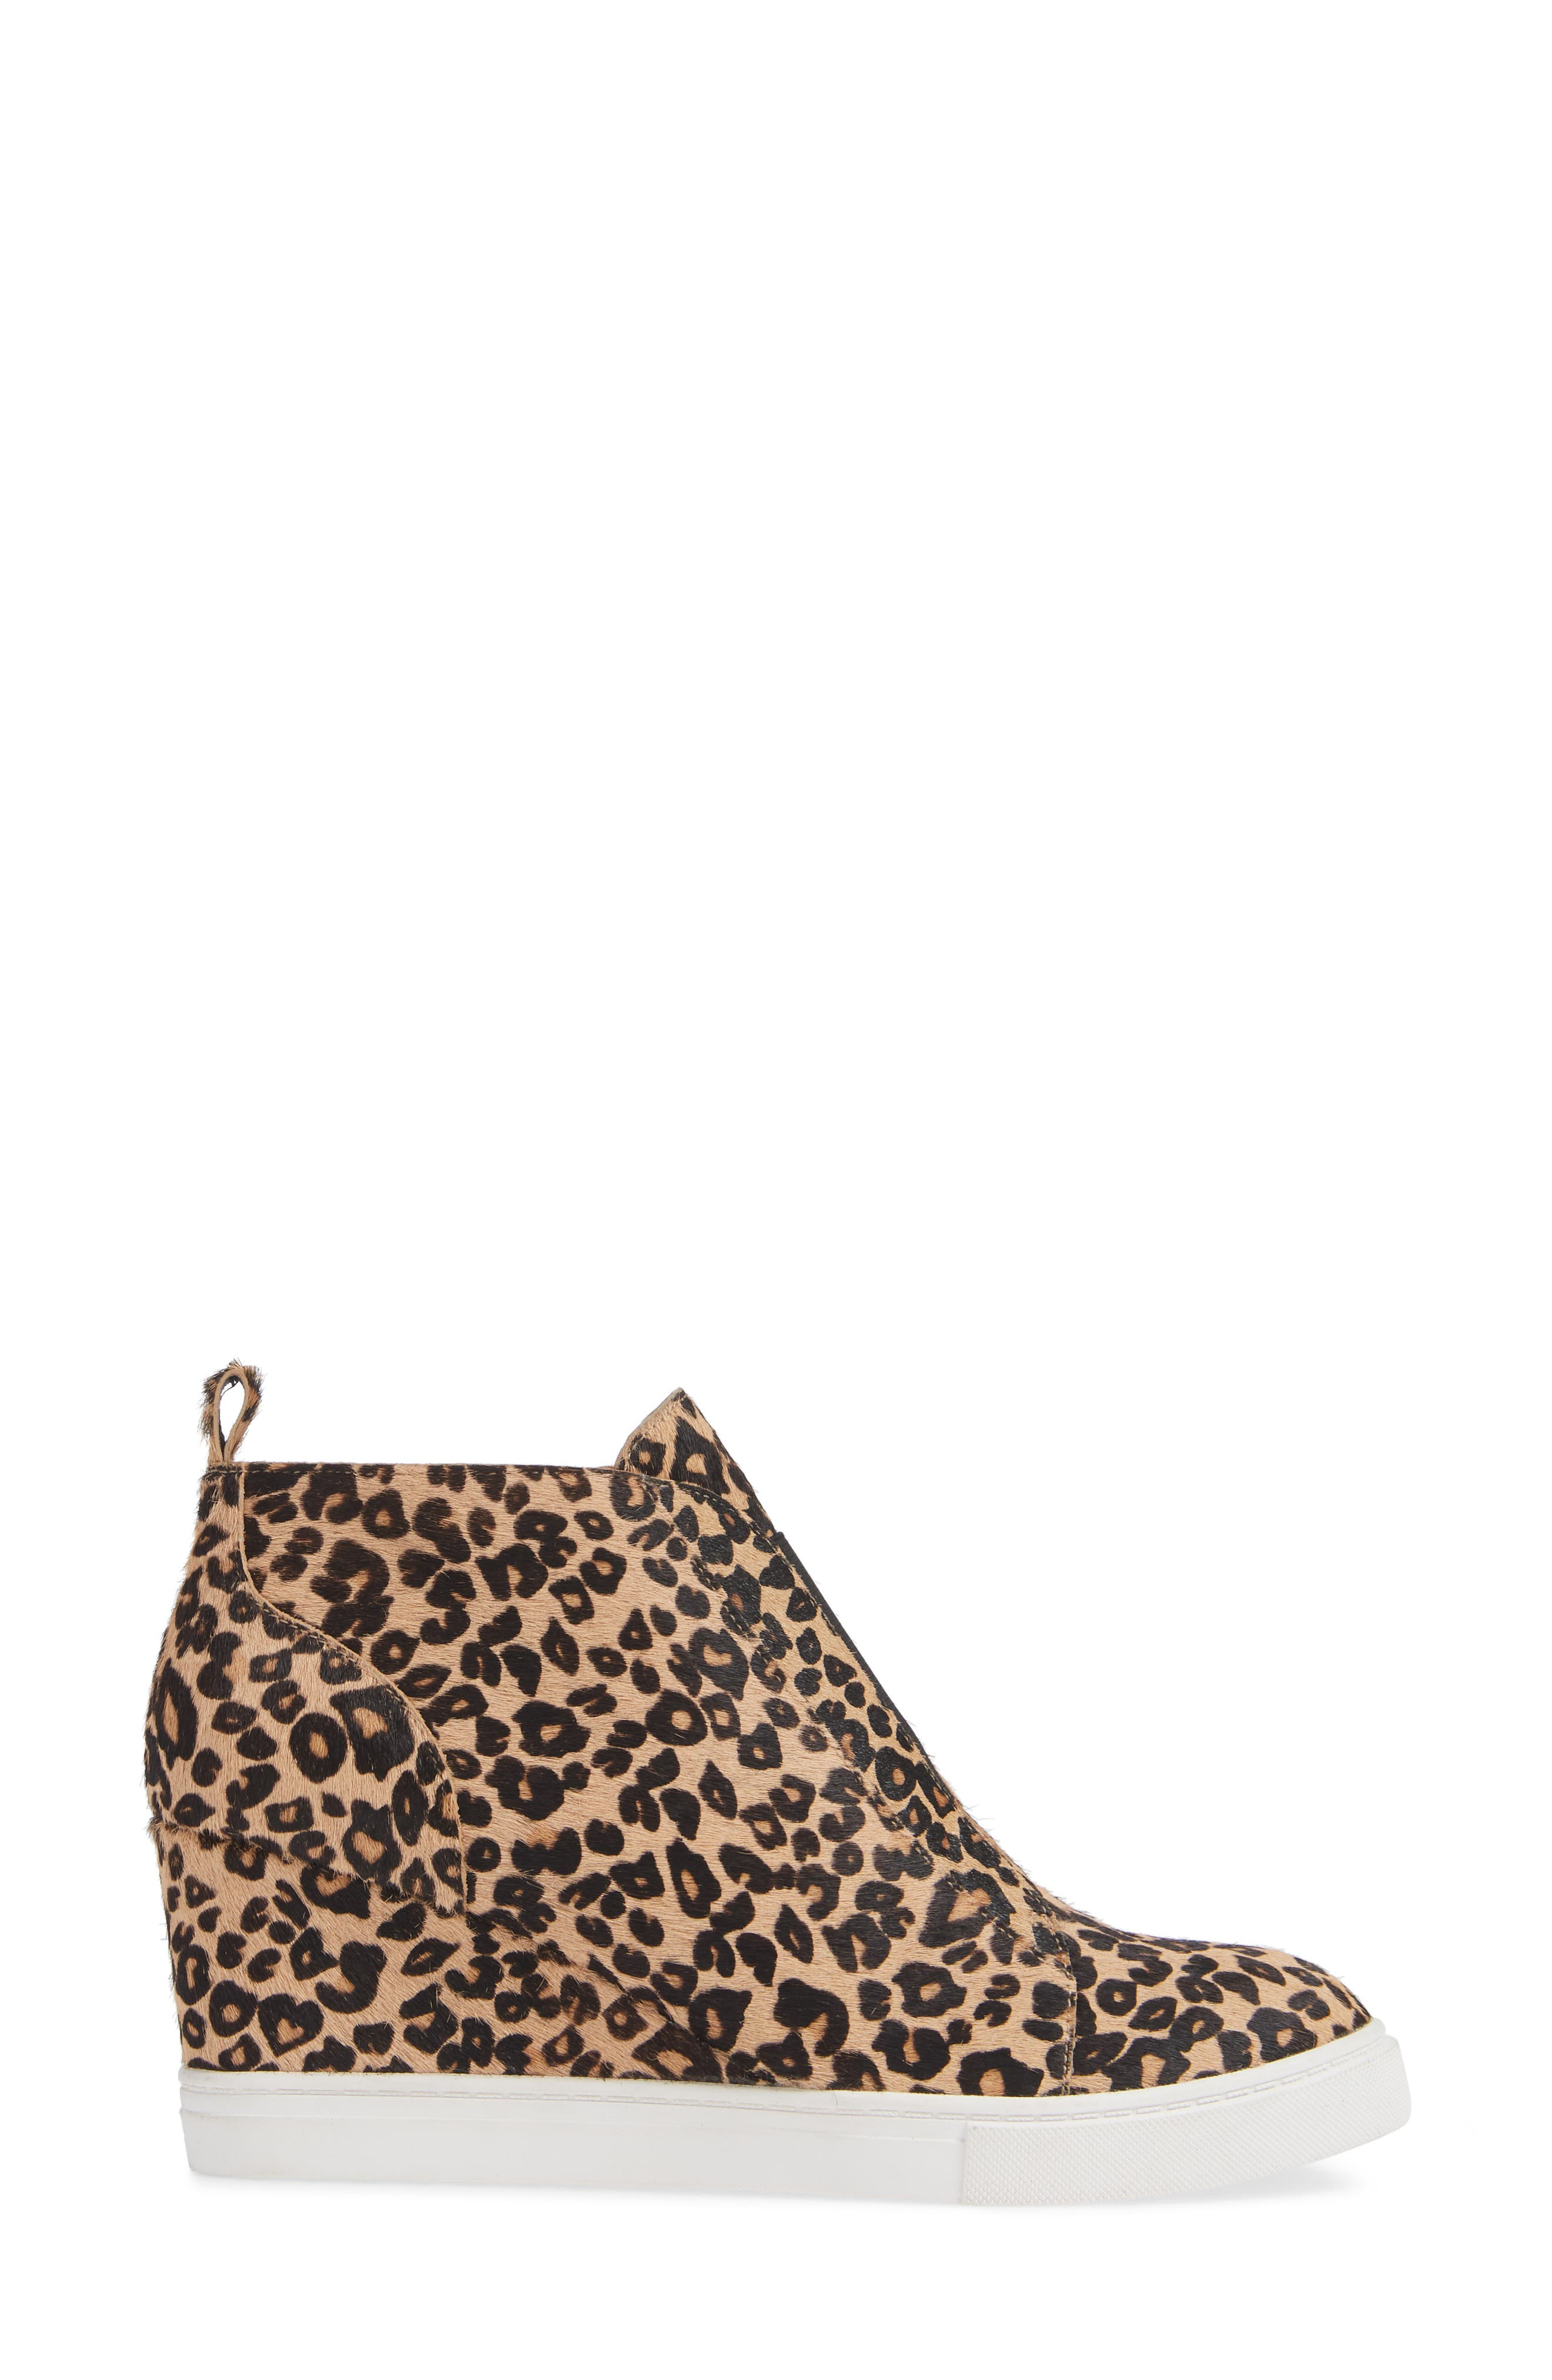 LINEA PAOLO, Felicia III Genuine Calf Hair Wedge Sneaker, Alternate thumbnail 3, color, LEOPARD PRINT HAIR CALF